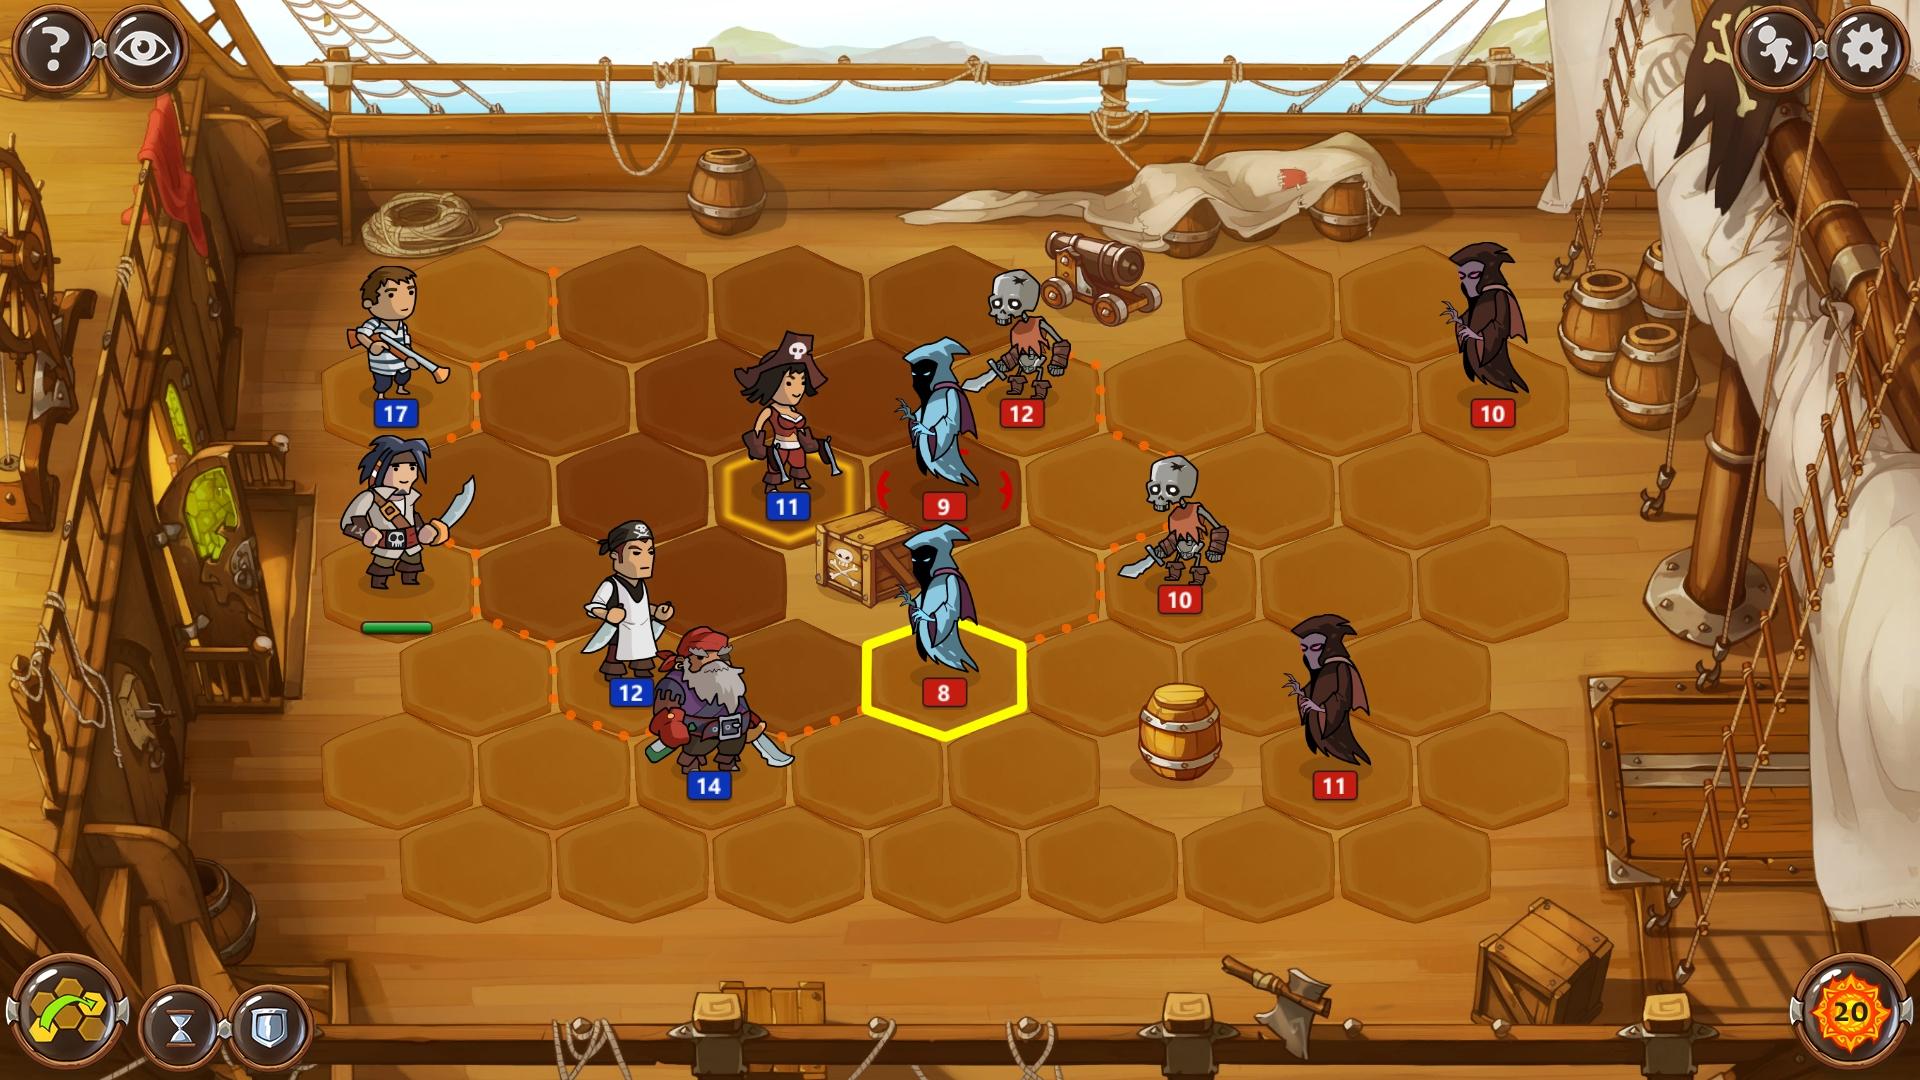 Drawn pirate linux Trilogy Pirate Team: Braveland Tortuga